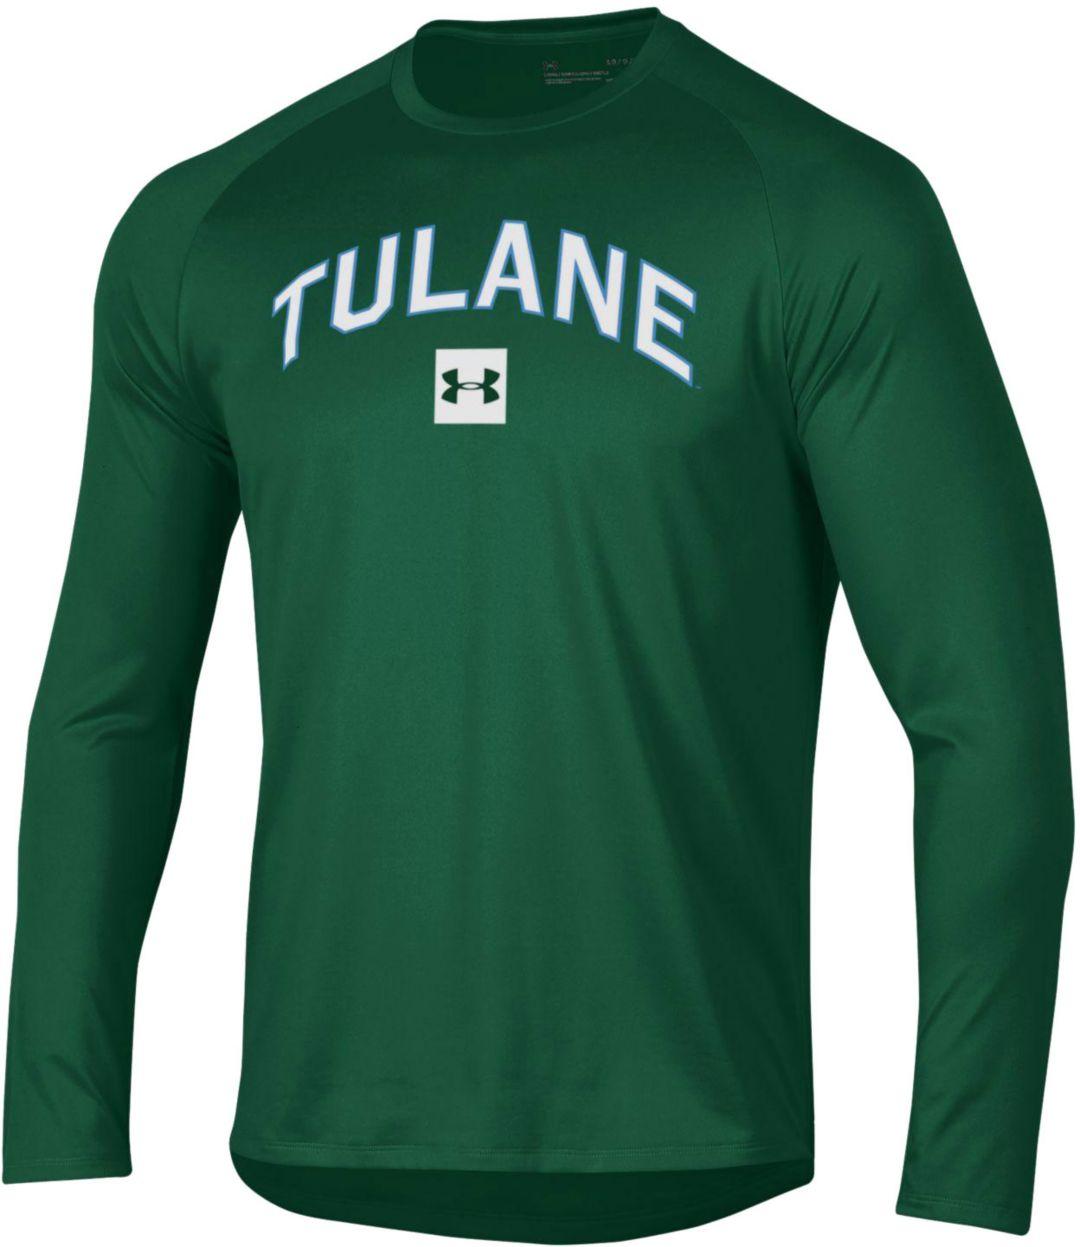 promo code d7d8d a695a Under Armour Men's Tulane Green Wave Olive Long Sleeve Tech Performance  T-Shirt